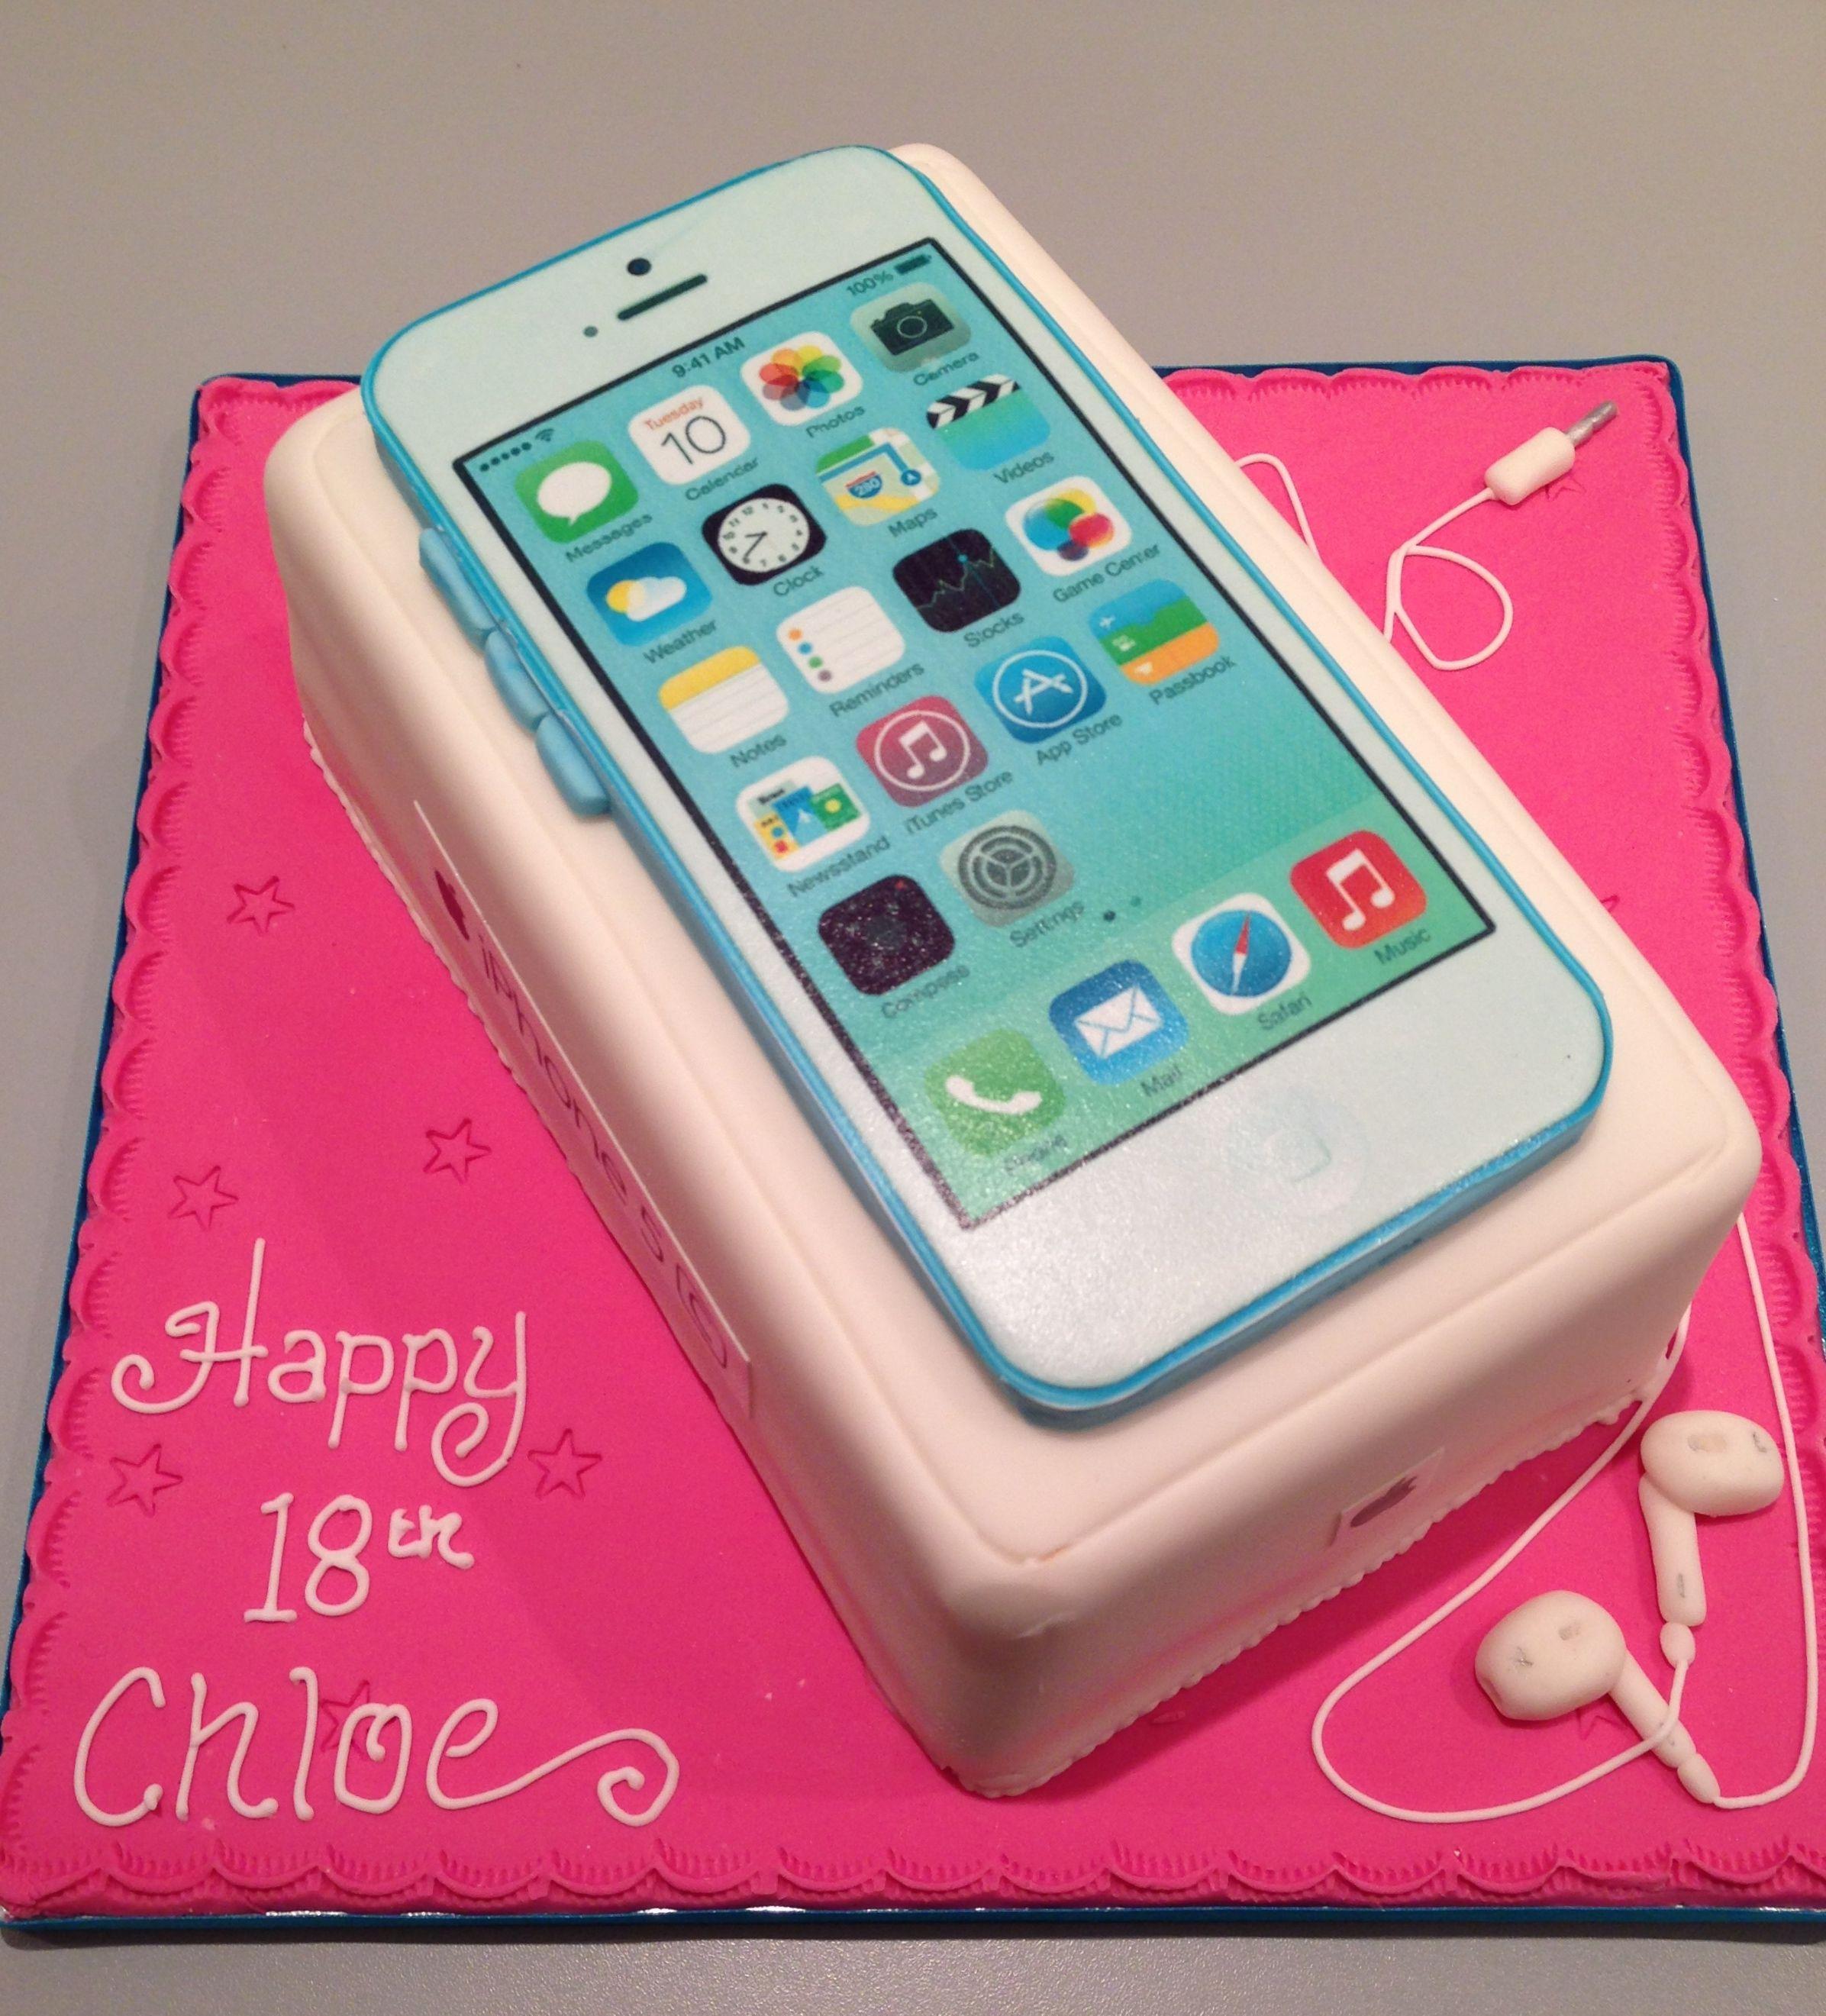 iPhone 5C Cake Stuff to Buy Pinterest iPhone 5C Cake and